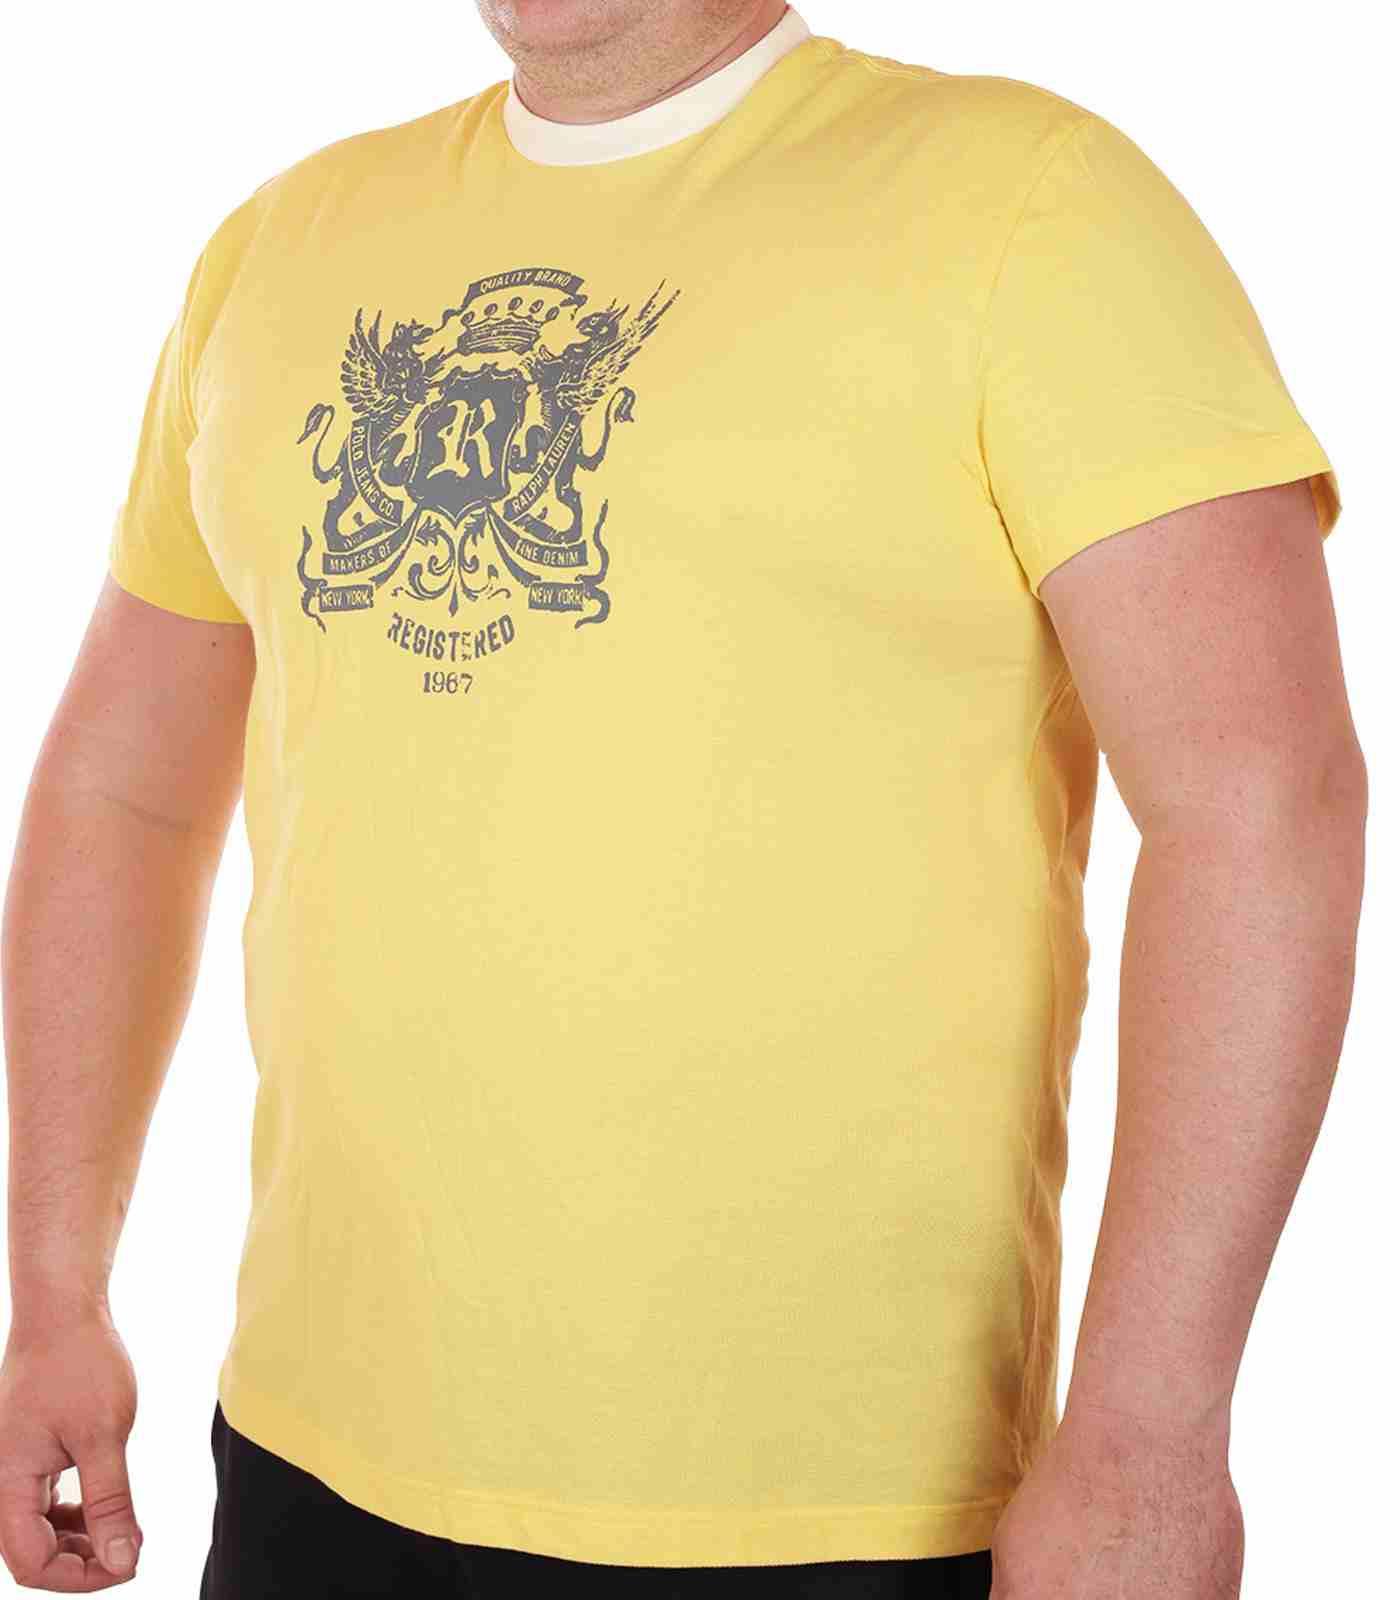 Гламурная футболка Ralph Lauren (США) для модных парней-главная